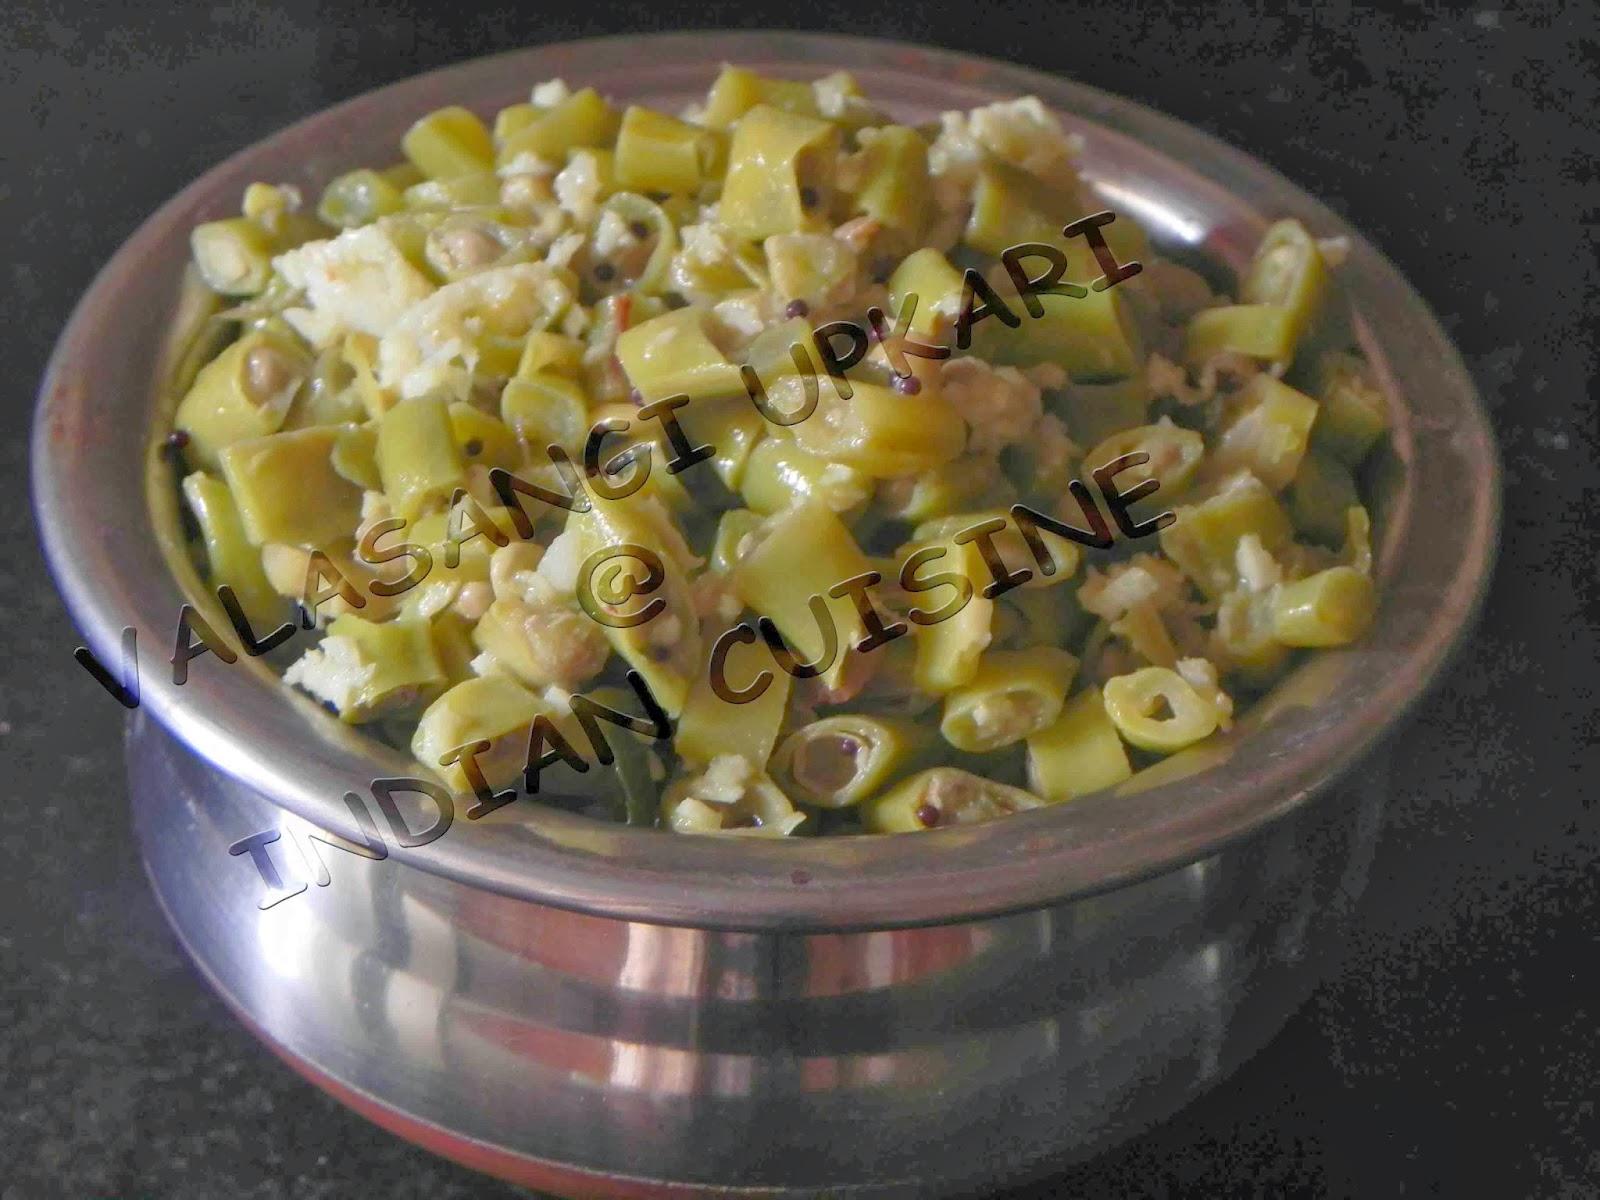 Konkani randap valasangi upkari long beans stir fry sidedish and valasangi upkari is one delicious dish of this vegetable among konkanis this vegetable is known as alsande kaayi in kannada and forumfinder Gallery